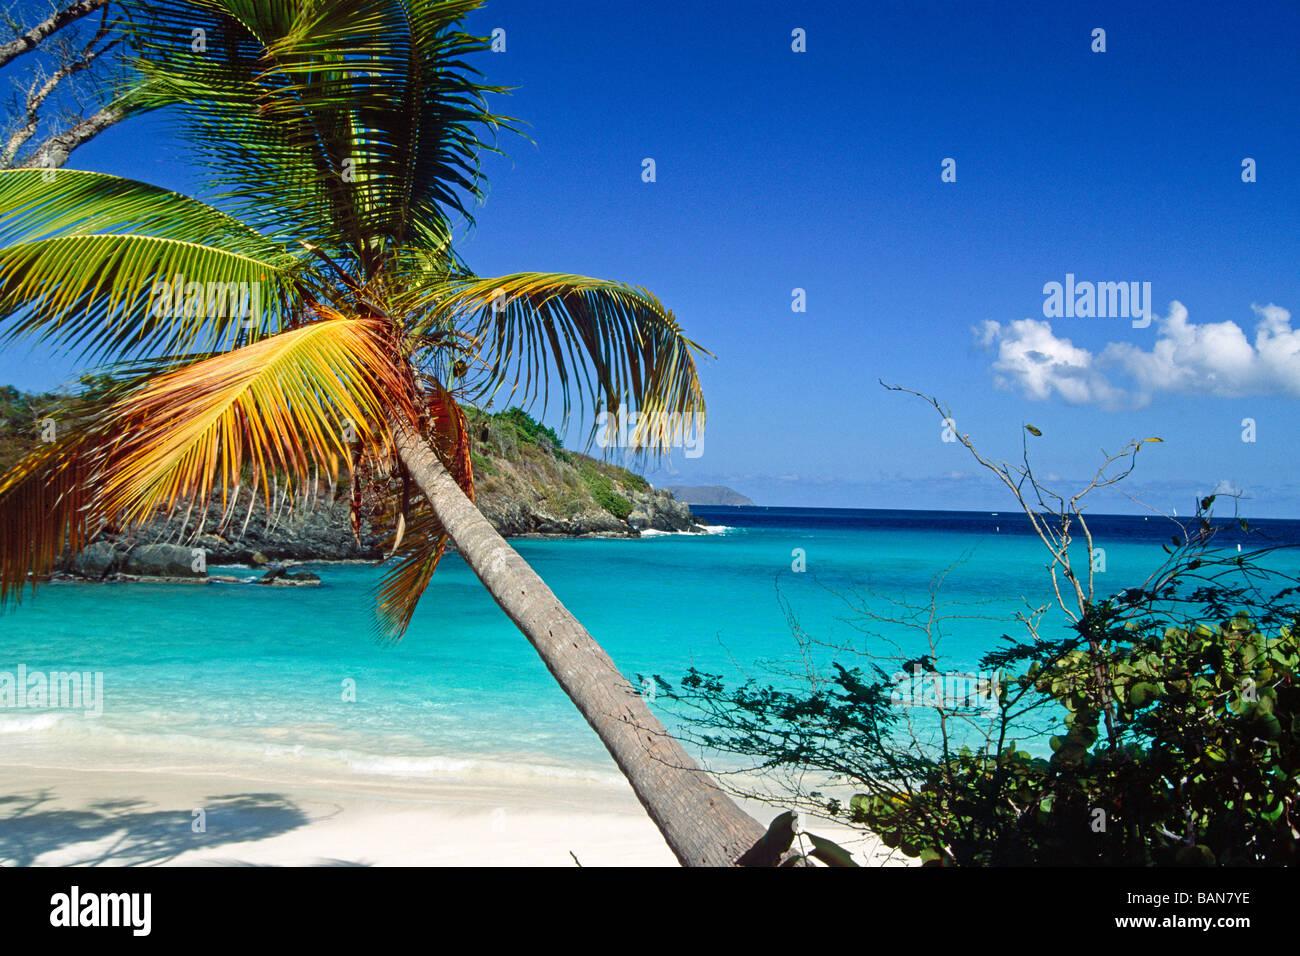 Us Virgin Islands Stock Images RoyaltyFree Images Vectors